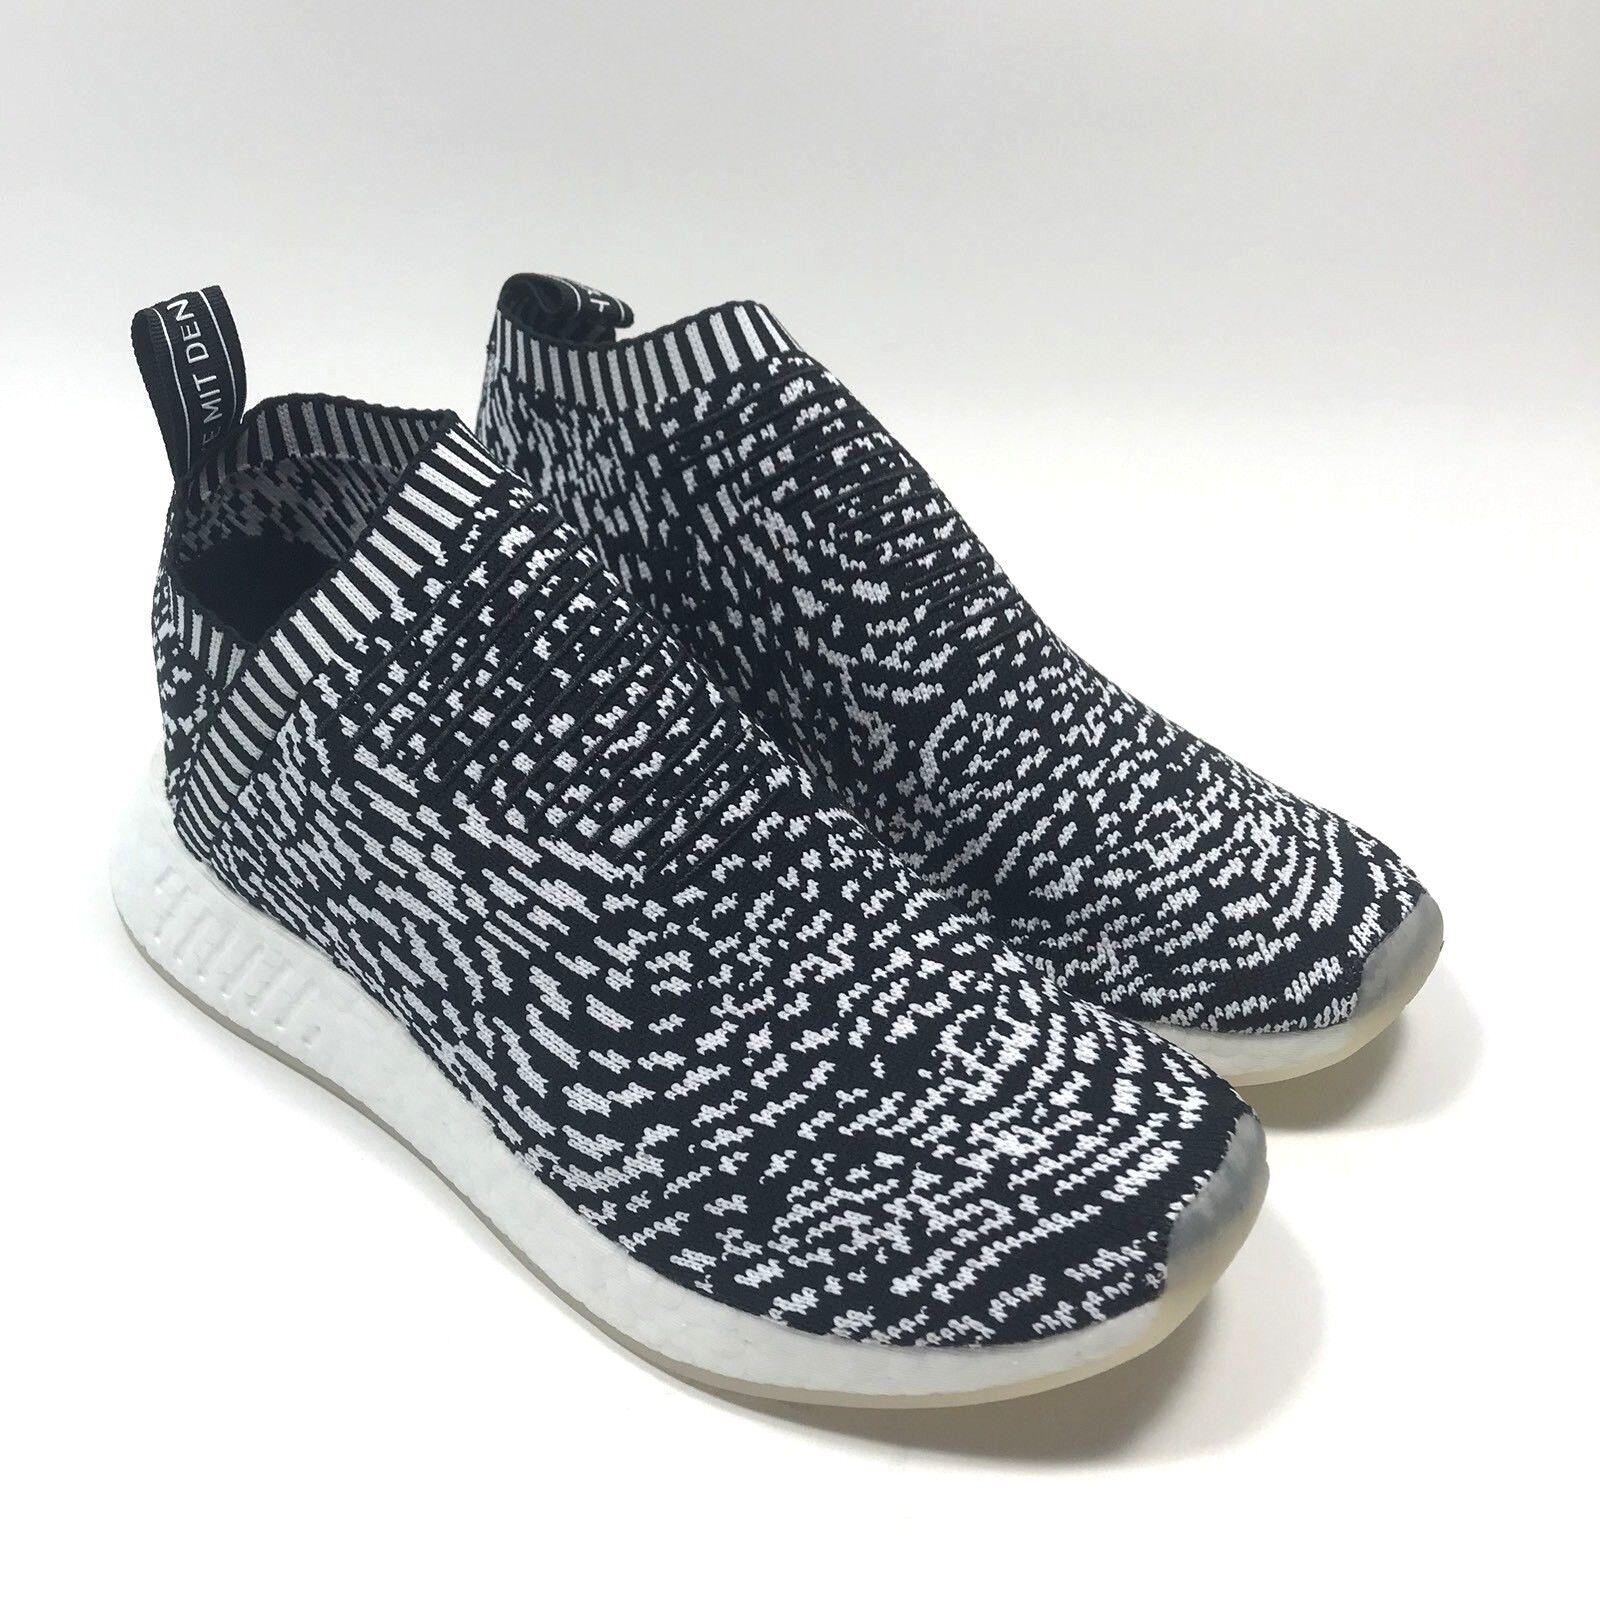 ee4f9e793b Adidas NMD CS2 PK City Sock 2 Sashiko Core Black White BY3012 Mens Size 9 12